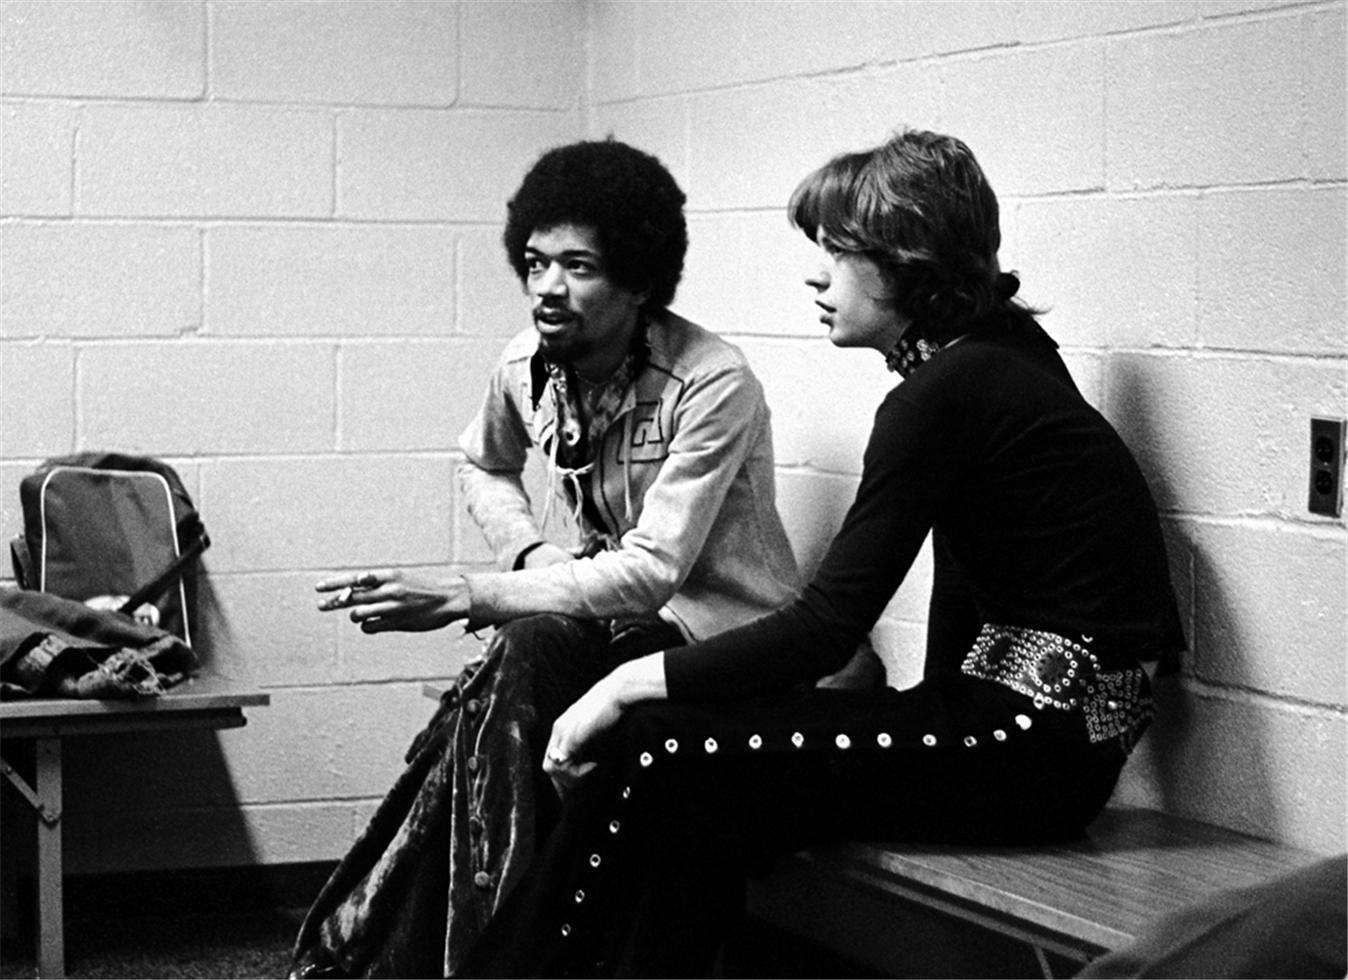 1969. Джимми Хендрикс и Мик Джаггер, Мэдисон Сквер Гарден, Нью-Йорк